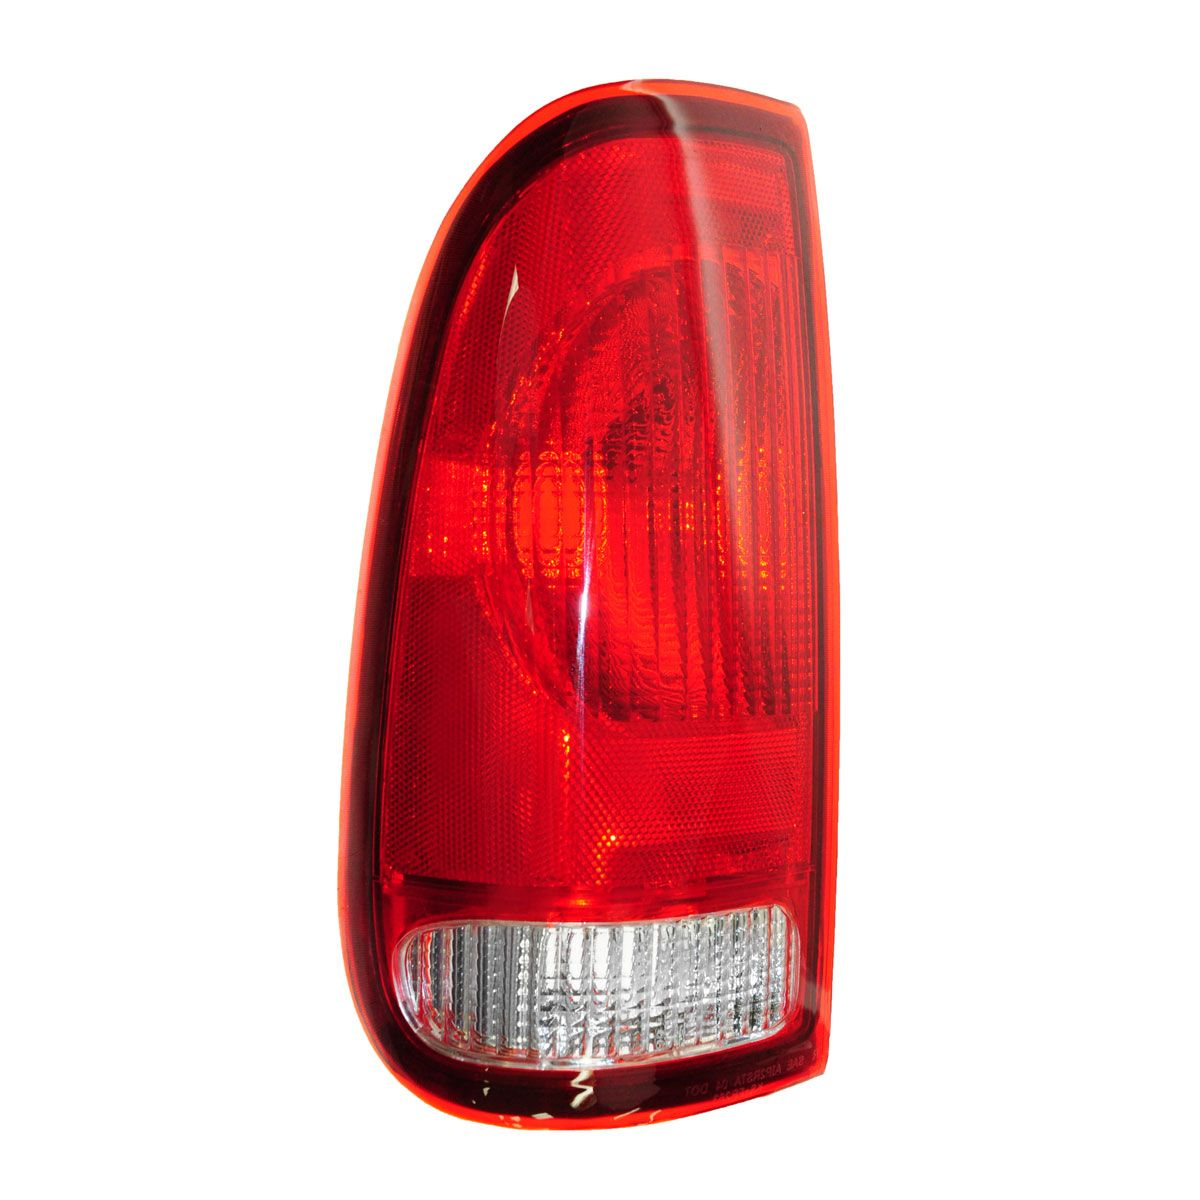 Headlight Parking Marker Lamp Tail Light Set Of 6 For 97